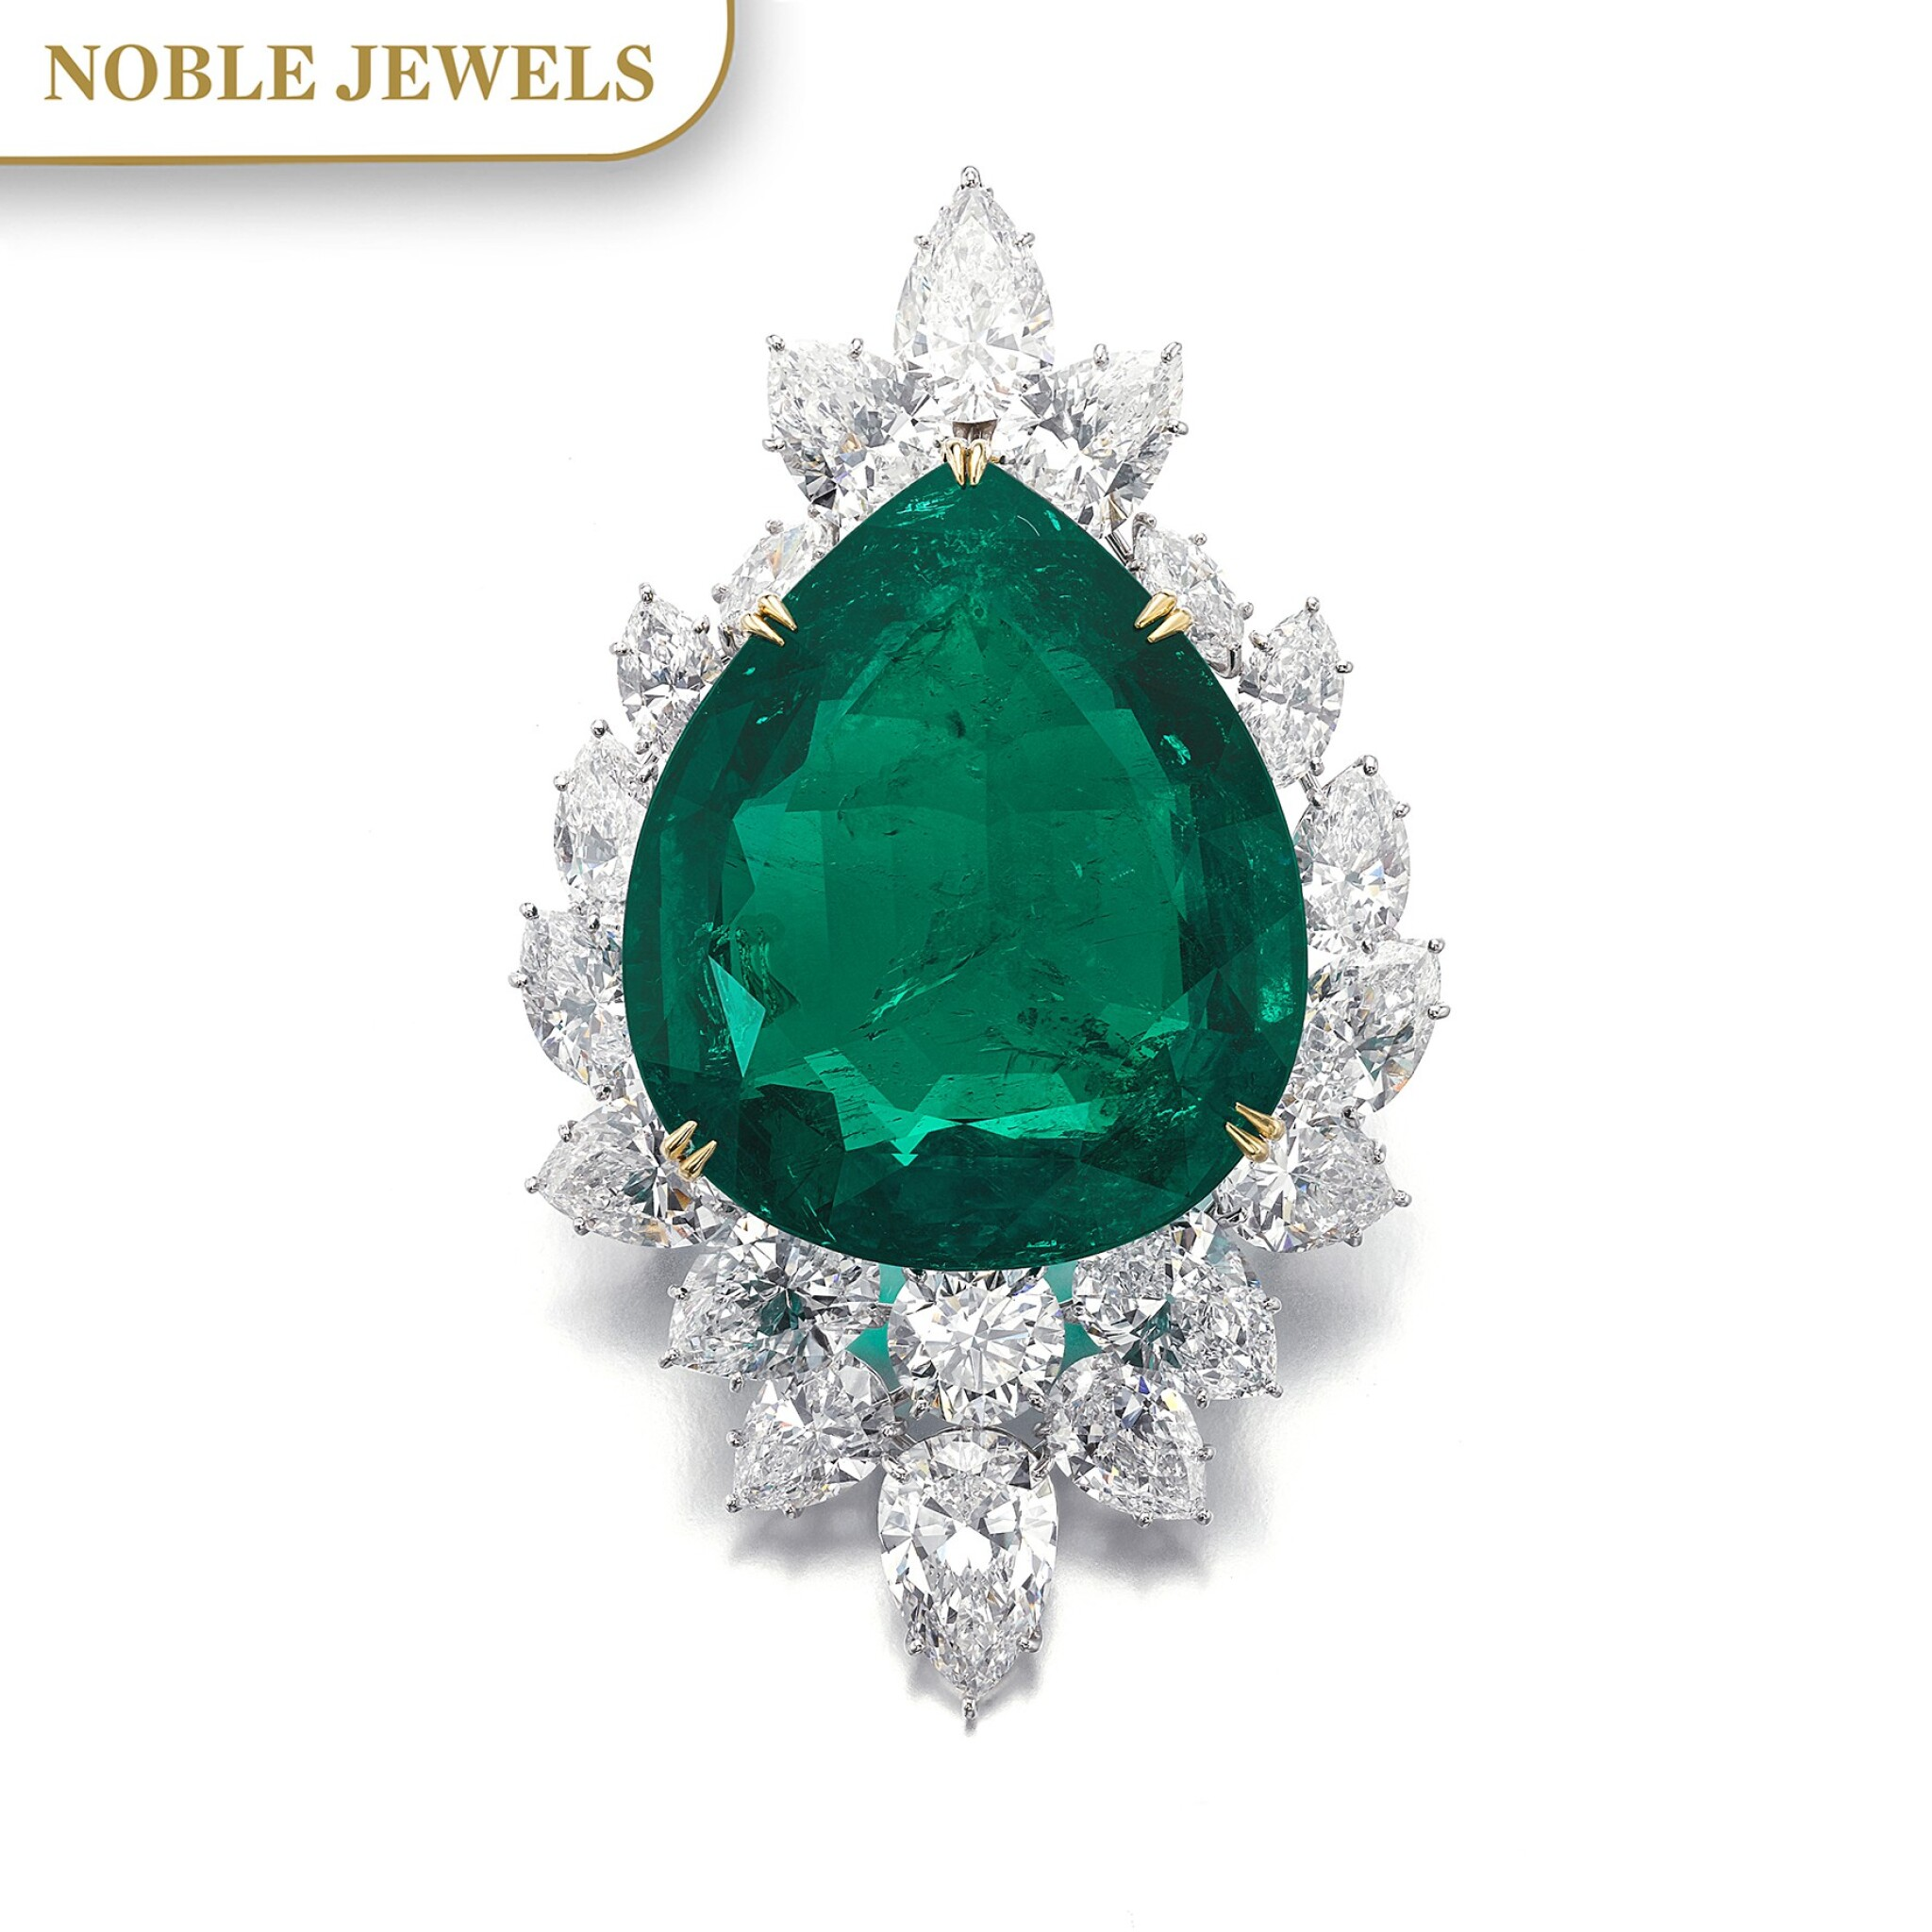 View full screen - View 1 of Lot 177.  Harry Winston   Very Important Emerald and diamond brooch/pendant combination, circa 1970   海瑞溫斯頓   祖母綠配鑽石別針/吊墜組合,約1970年.